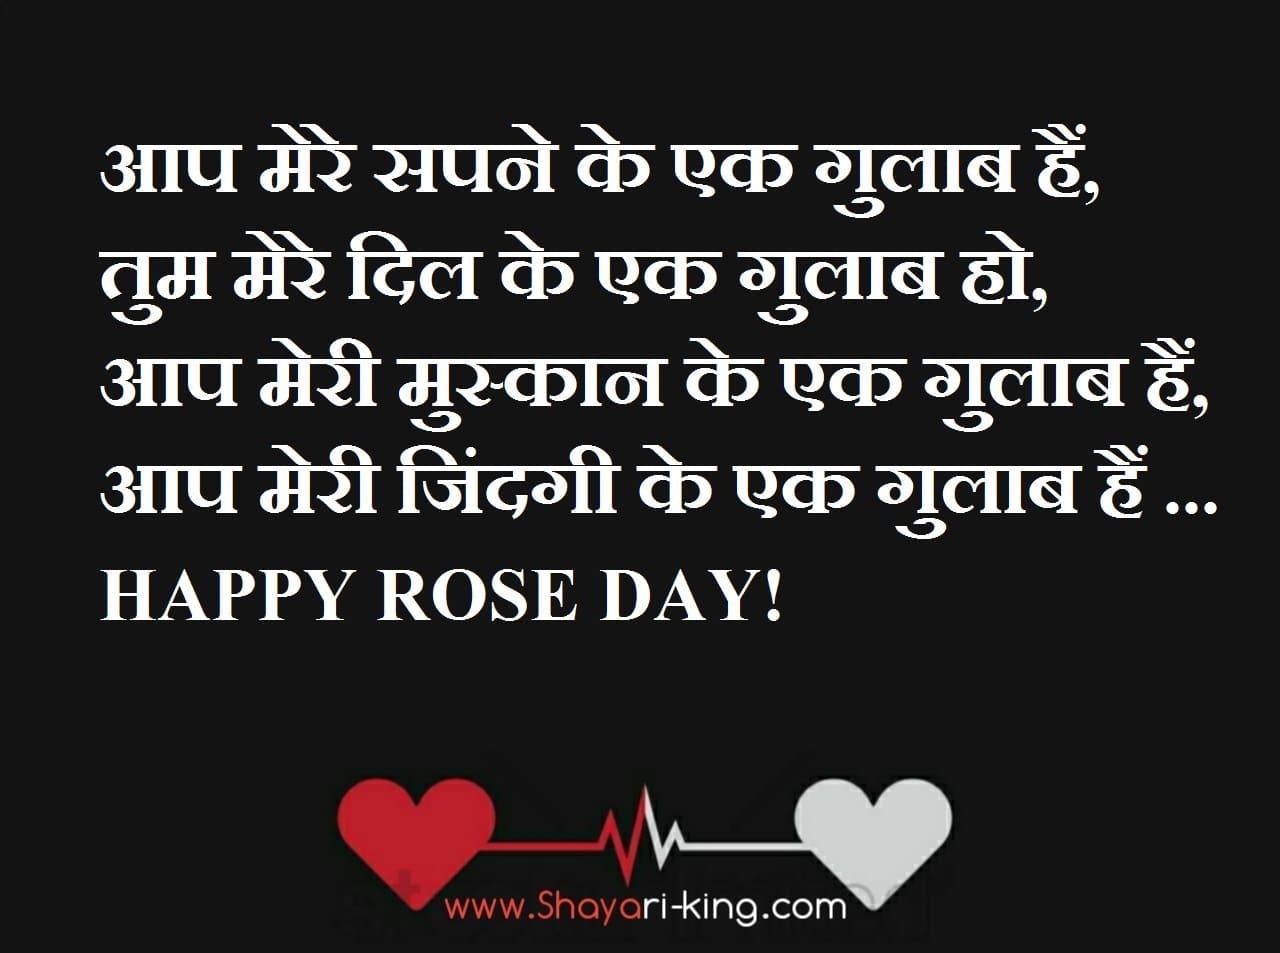 Rose day quotes shayari in hindi